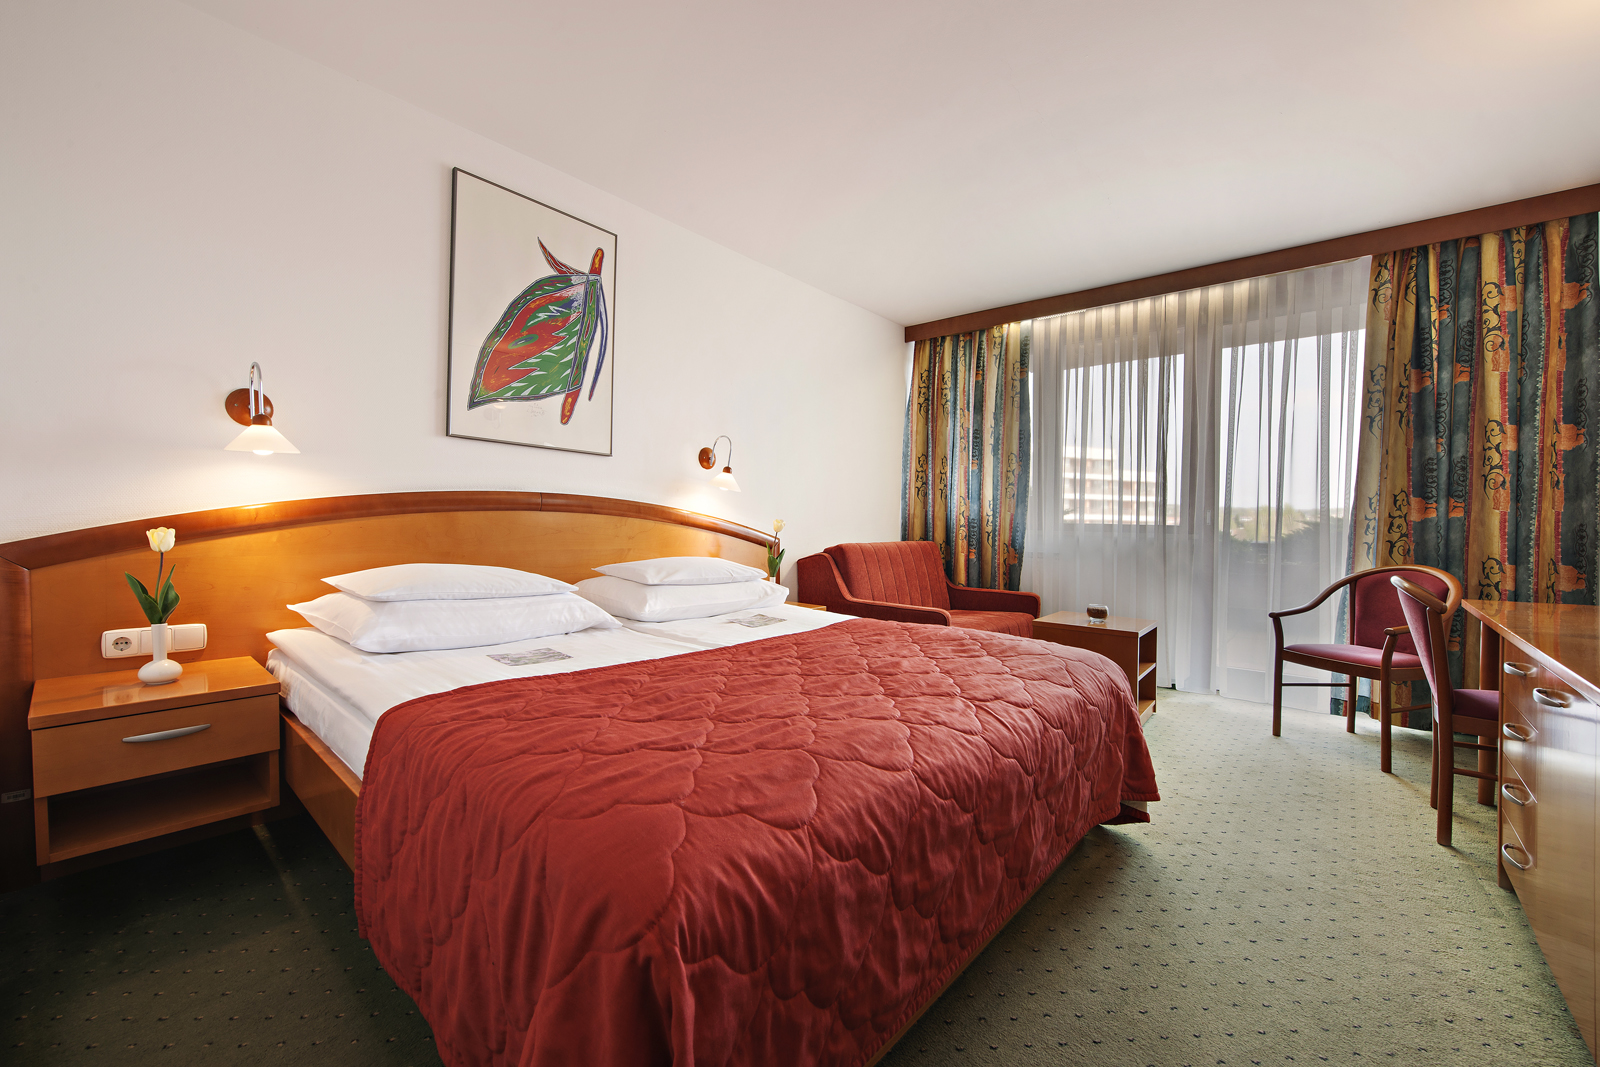 HotelAjda_ClassicDoubleRoom_01_052017_DD_lowres